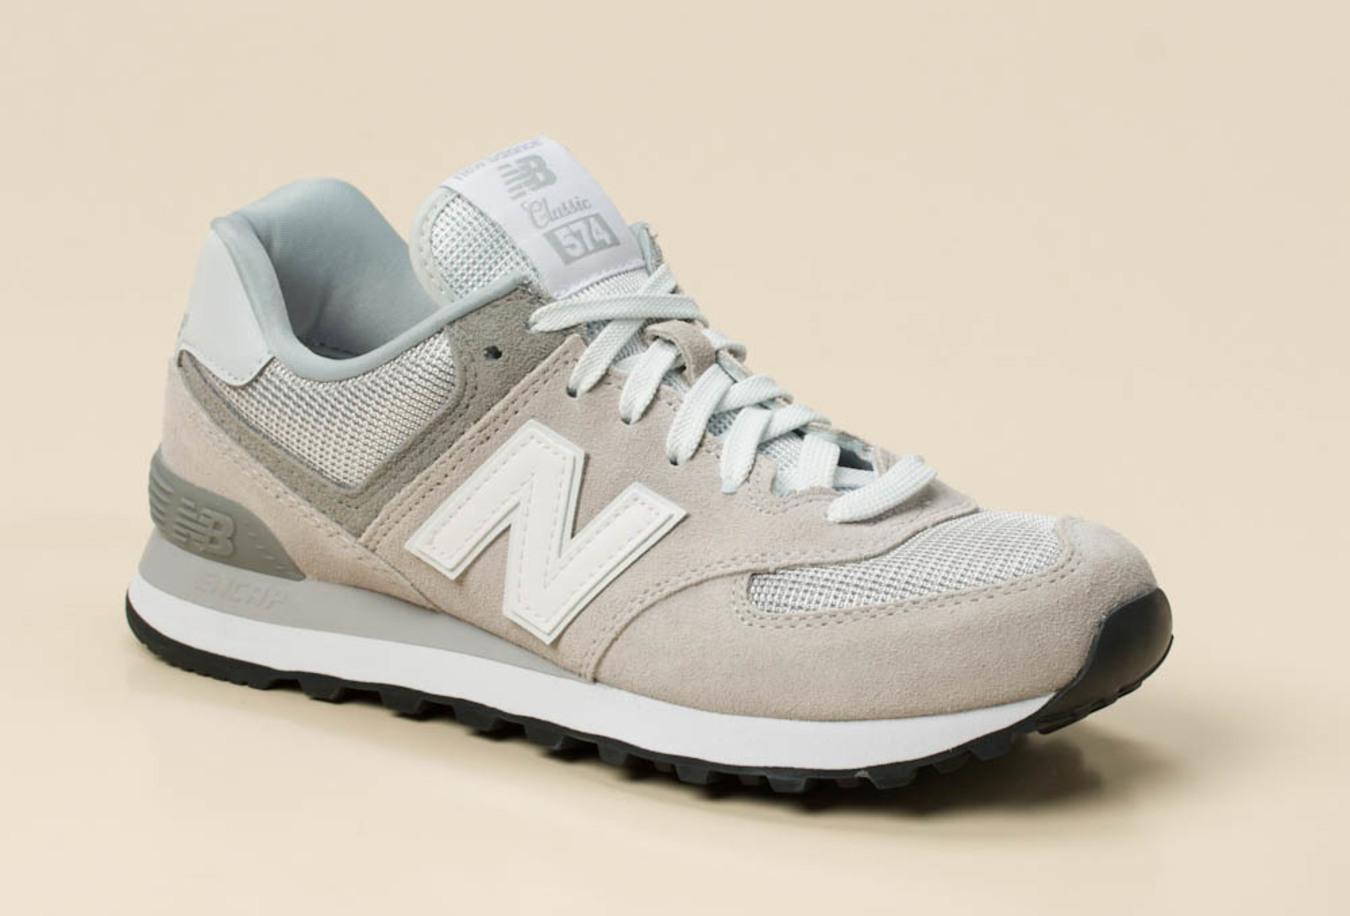 quality design 71ba9 941c7 New Balance Damen Sneaker in grau kaufen | Zumnorde Online-Shop